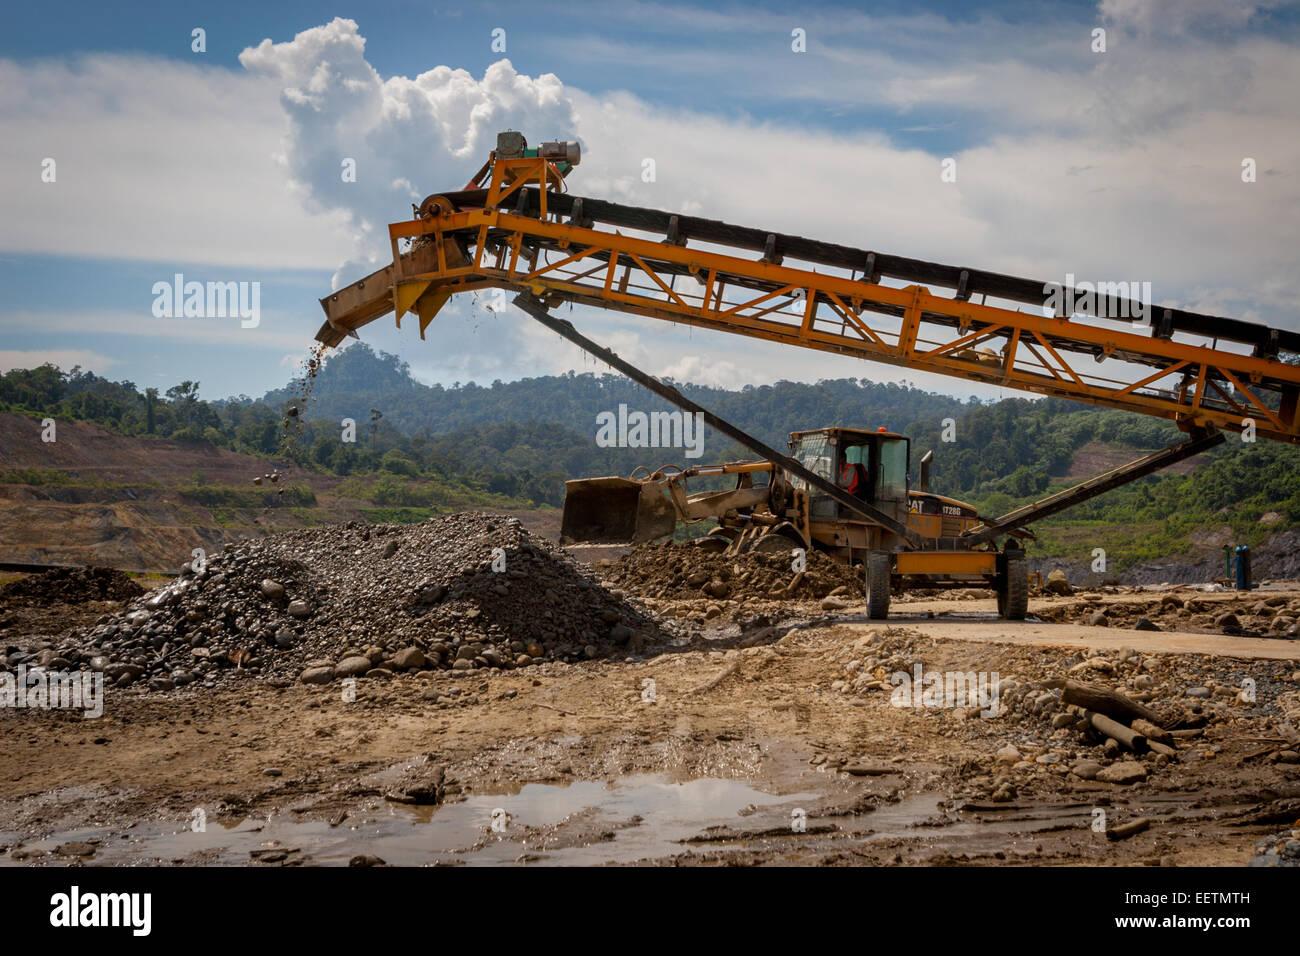 Activities on Rio Tinto Kelian mine closure project in Borneo. - Stock Image